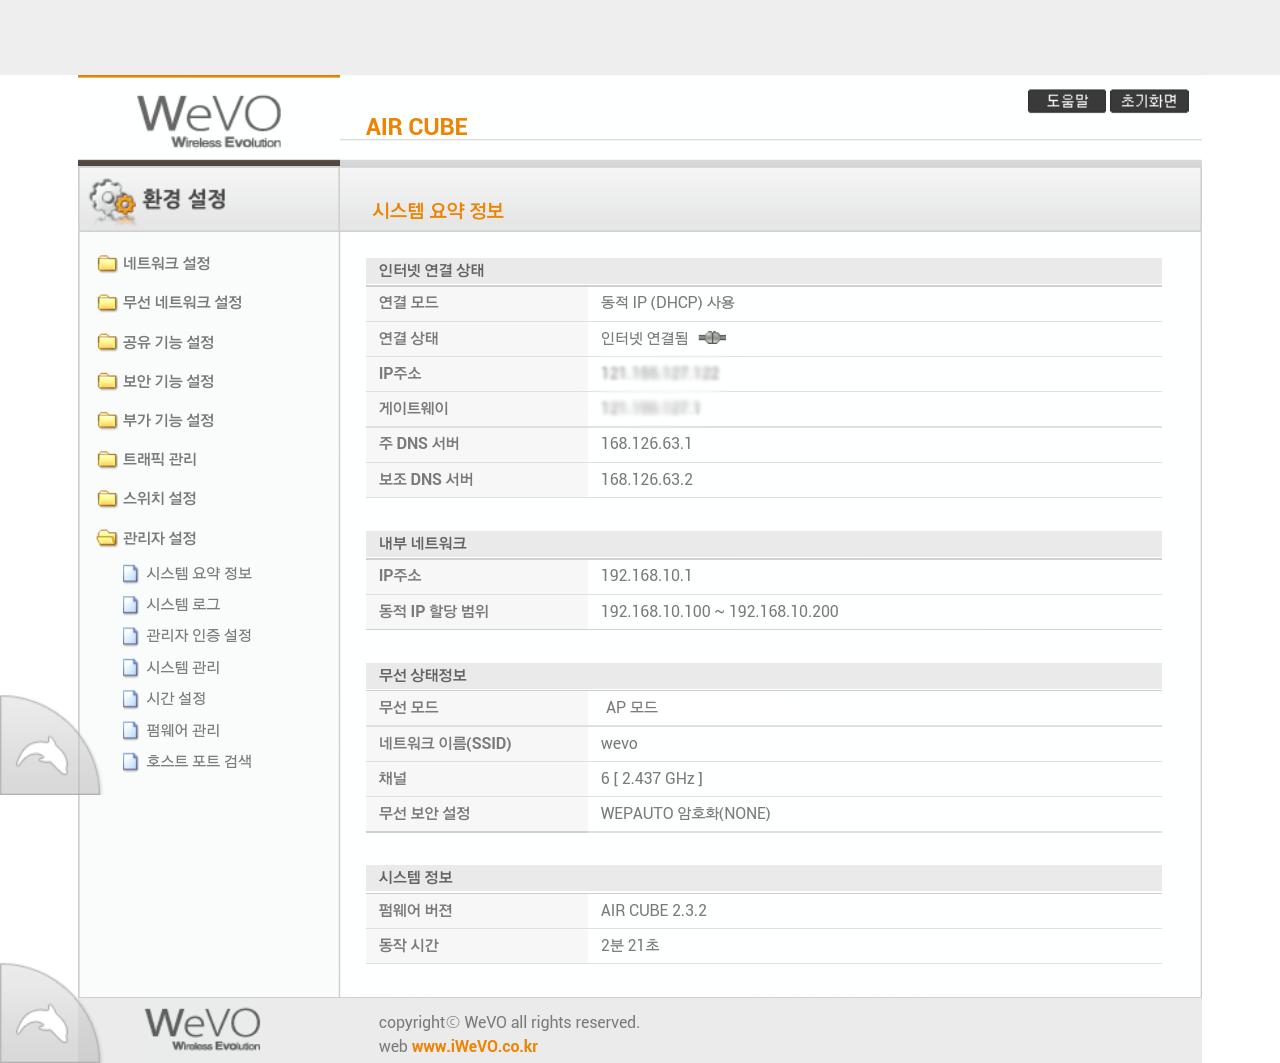 iptime 무선공유기, It, IT뉴스, IT리뷰, OCER, ocer리뷰, PC, pc리뷰, pc부품, pc하드웨어, sk브로드밴드 공유기, W622SL, w723gl, wevo air, wevo air cube, wevo tv, wevo w622sl, wevo 공유기, wevo 공유기 설정, wevo 모니터, wevo 비밀번호 설정, wevo 비밀번호위보, wevo 설정, wevo 설치, wevo 와이파이, wevo 티비, 공유기, 디지털존, 리뷰, 무선공유기, 사진, 스마트폰, 와이파이, 와이파이 공유기 가격, 와이파이 공유기 비밀번호, 와이파이 공유기 설치, 와이파이 공유기 설치방법, 와이파이 공유기 요금, 와이파이 공유기 추천, 와이파이 공유기 파는곳, 와이파이 신호 강하게, 와이파이무선공유기설치, 와이파이에그, 와이파이존 만들기, 이슈, 집에서 공유기없이 와이파이, 컴퓨터부품, 타운뉴스, 타운리뷰, 타운염장, 타운포토, 하드웨어 리뷰, 휴대용 와이파이 공유기